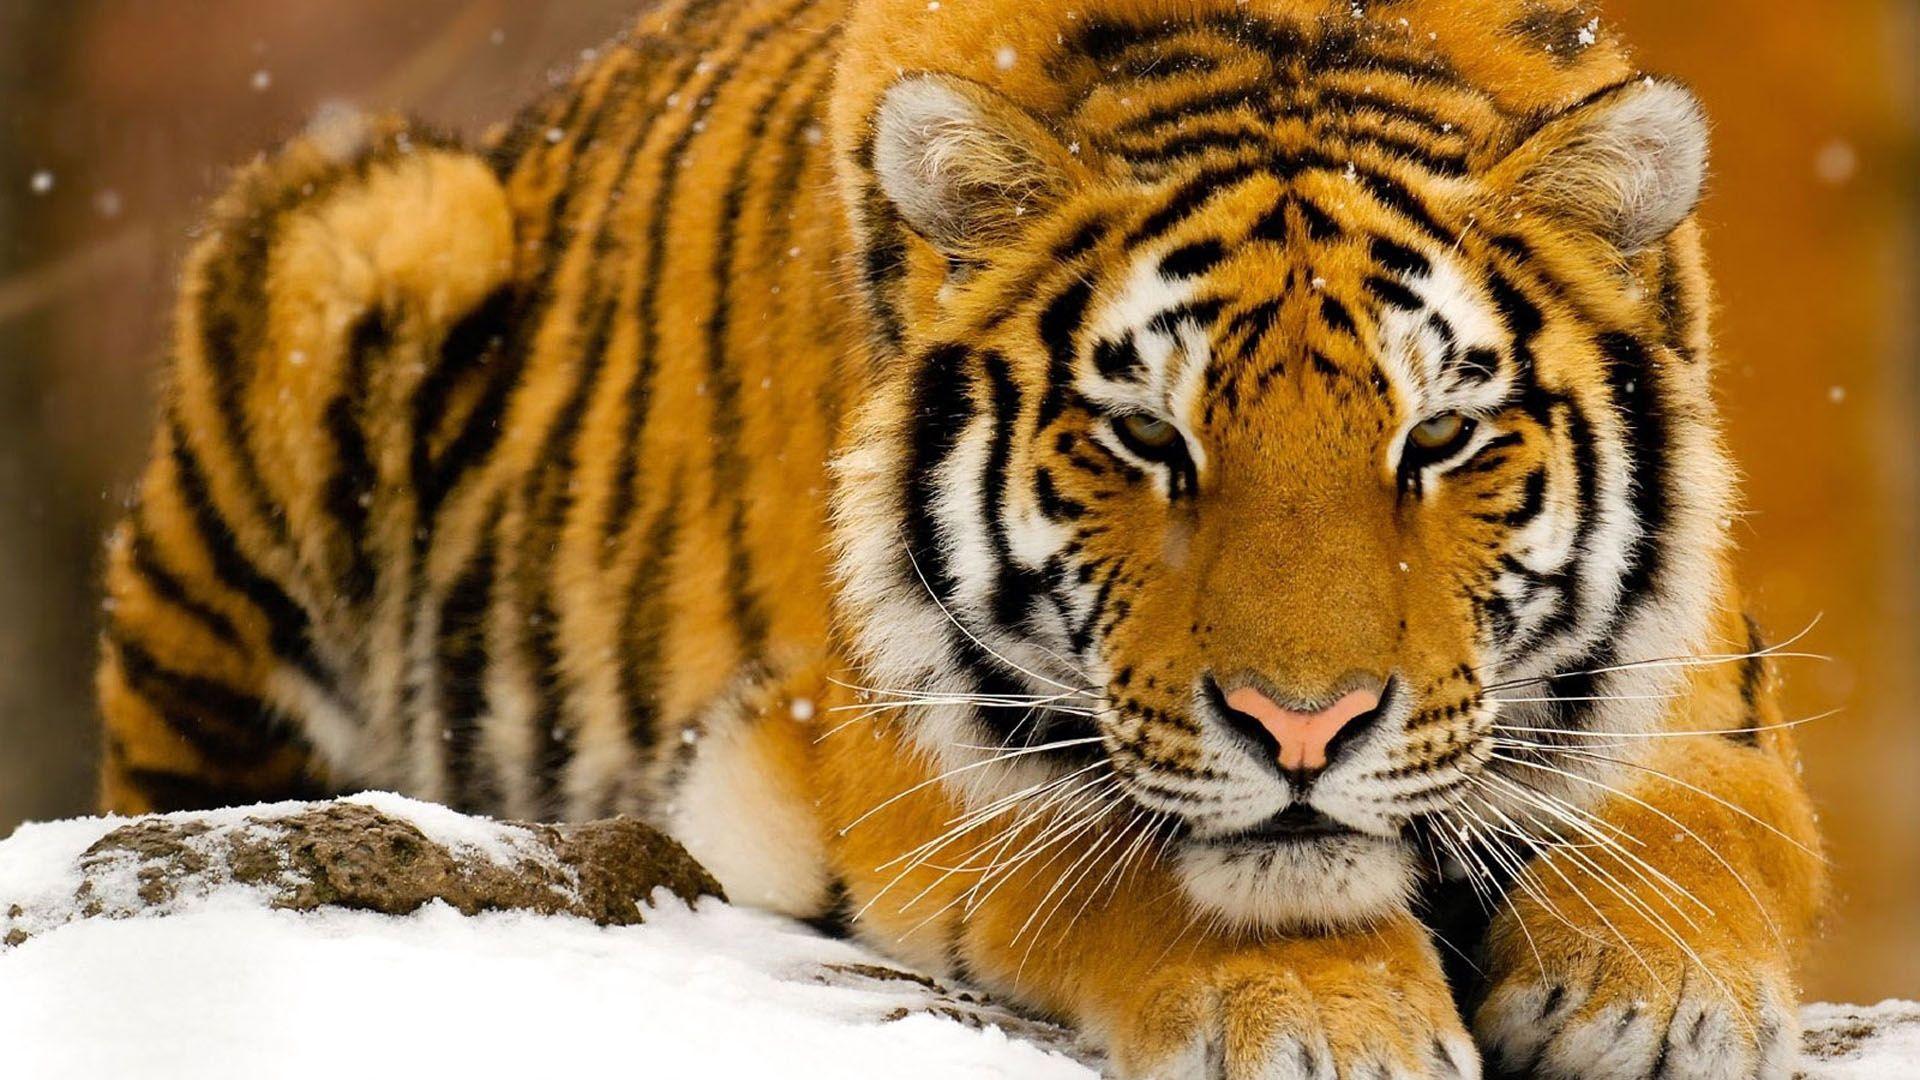 Download Tiger, Predator, Big Cat Snow Lie Face Wallpaper